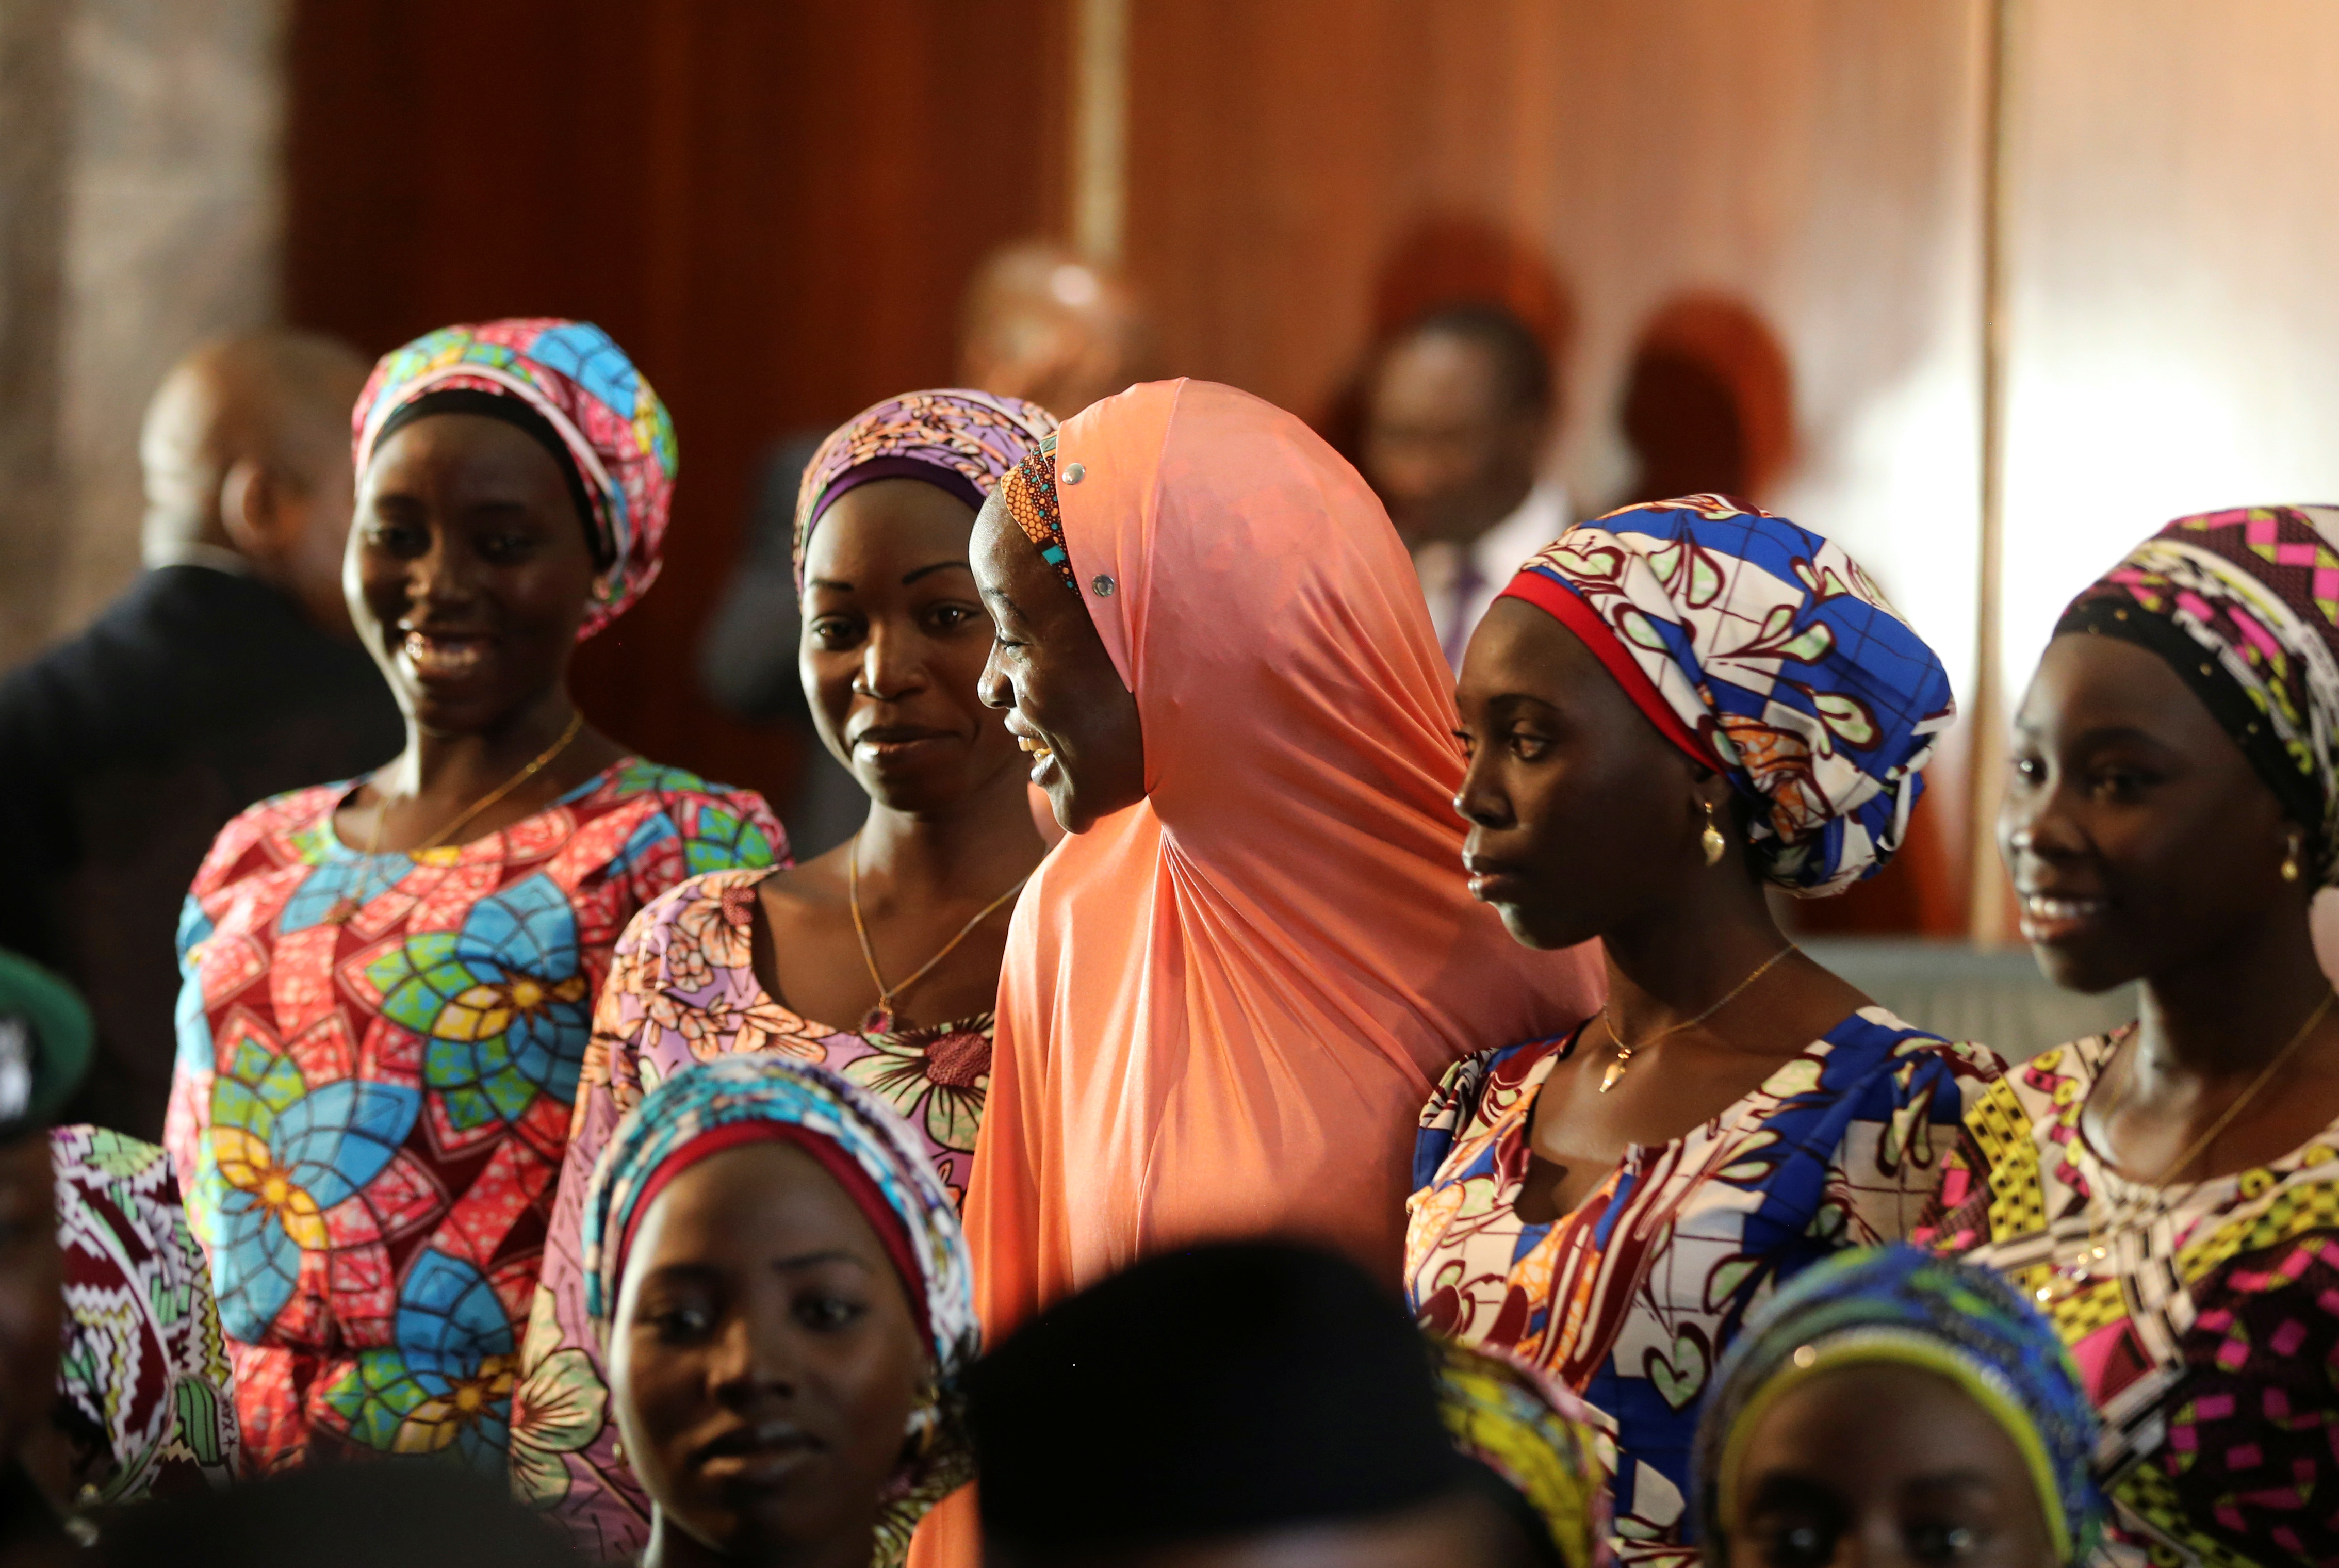 Some of the 21 Chibok schoolgirls released by Boko Haram look on during their visit to meet President Muhammadu Buhari In Abuja, Nigeria October 19, 2016 REUTERS/Afolabi Sotunde - S1BEUHWXBXAA